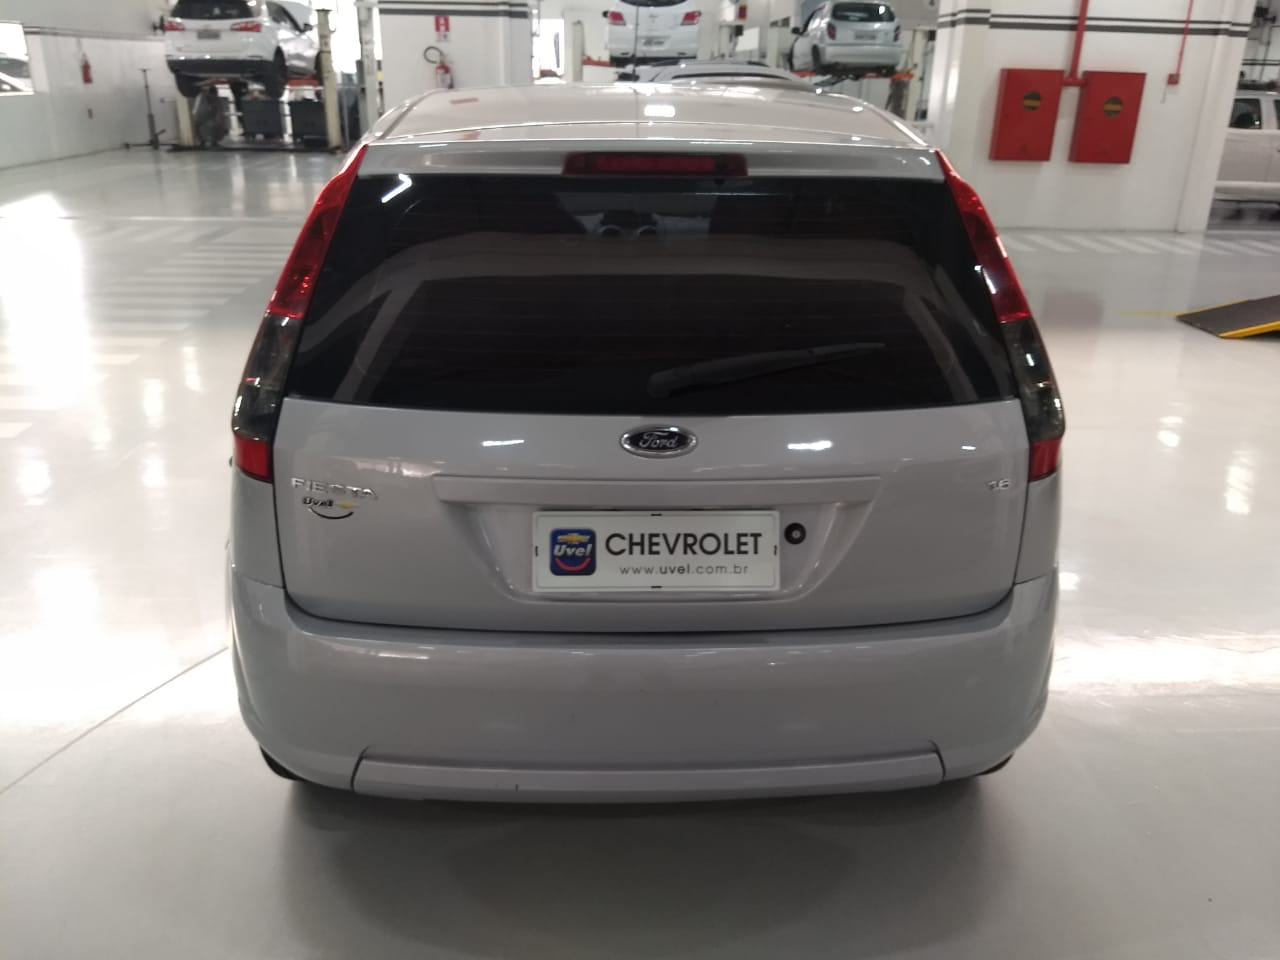 Ford Fiesta HATCH 1.6L 2012